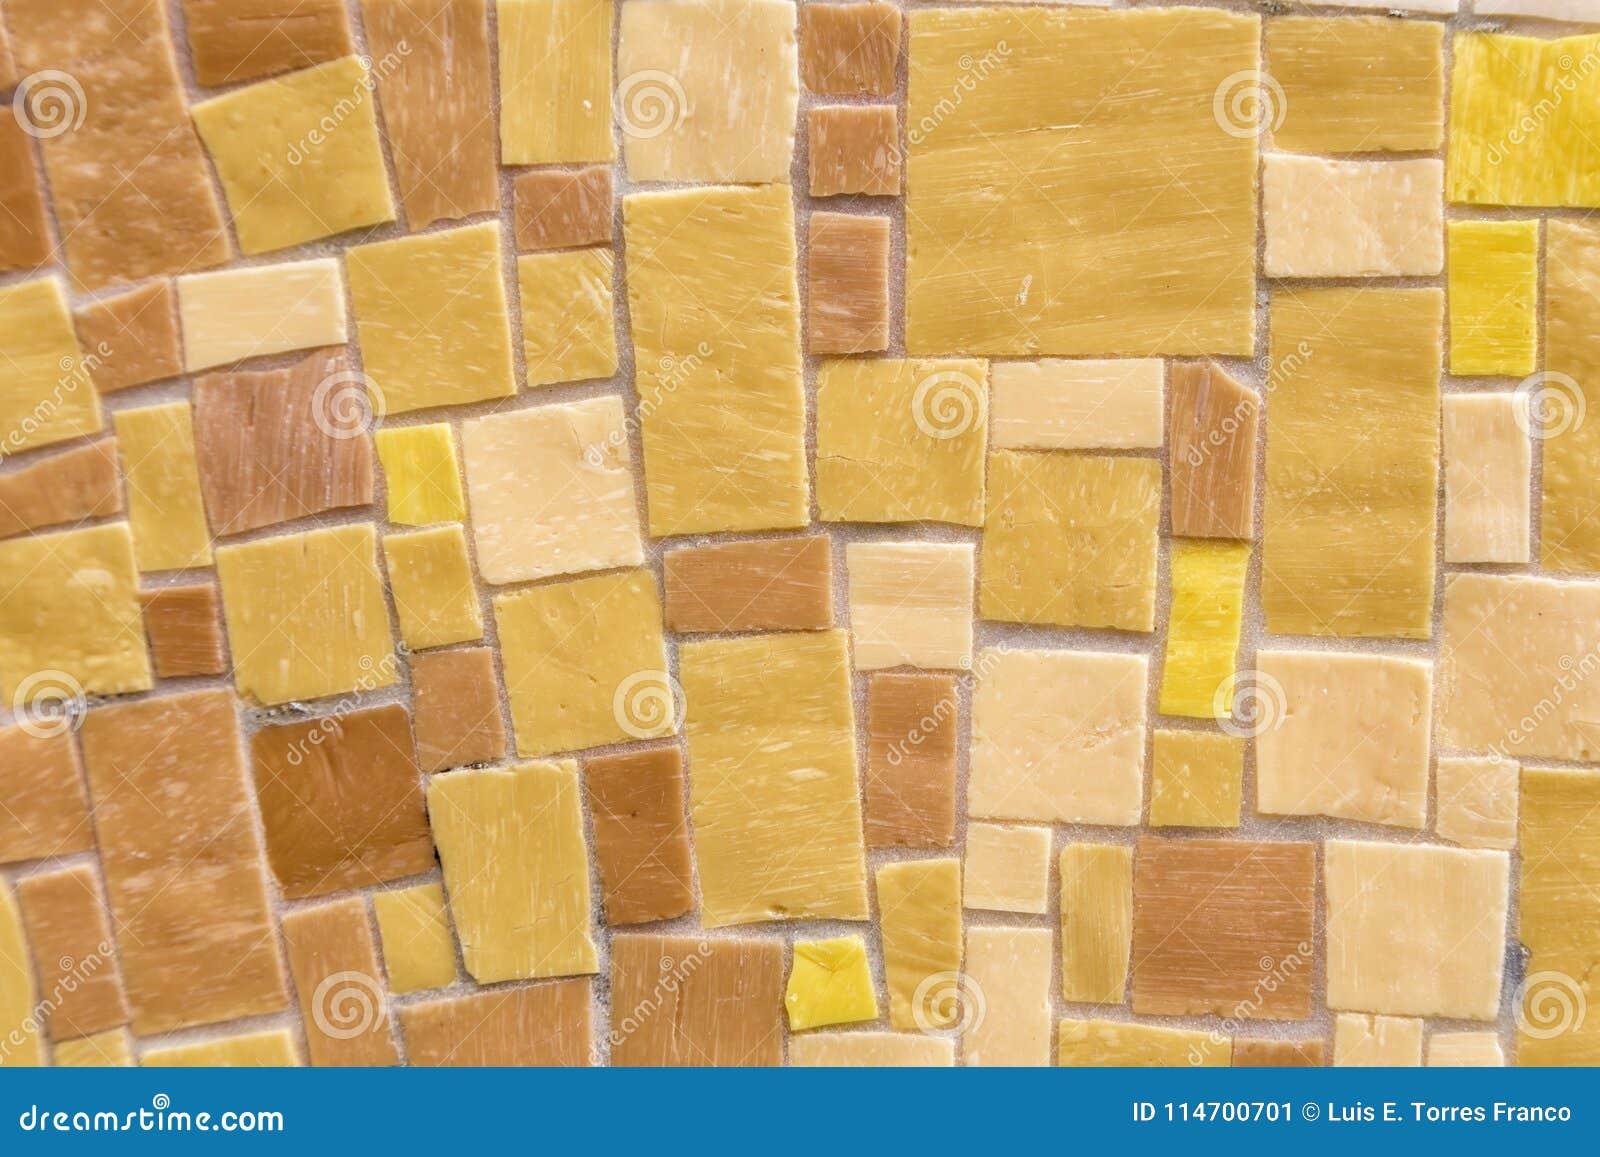 Colorful Mosaic Wall Background Stock Image - Image of decorative ...